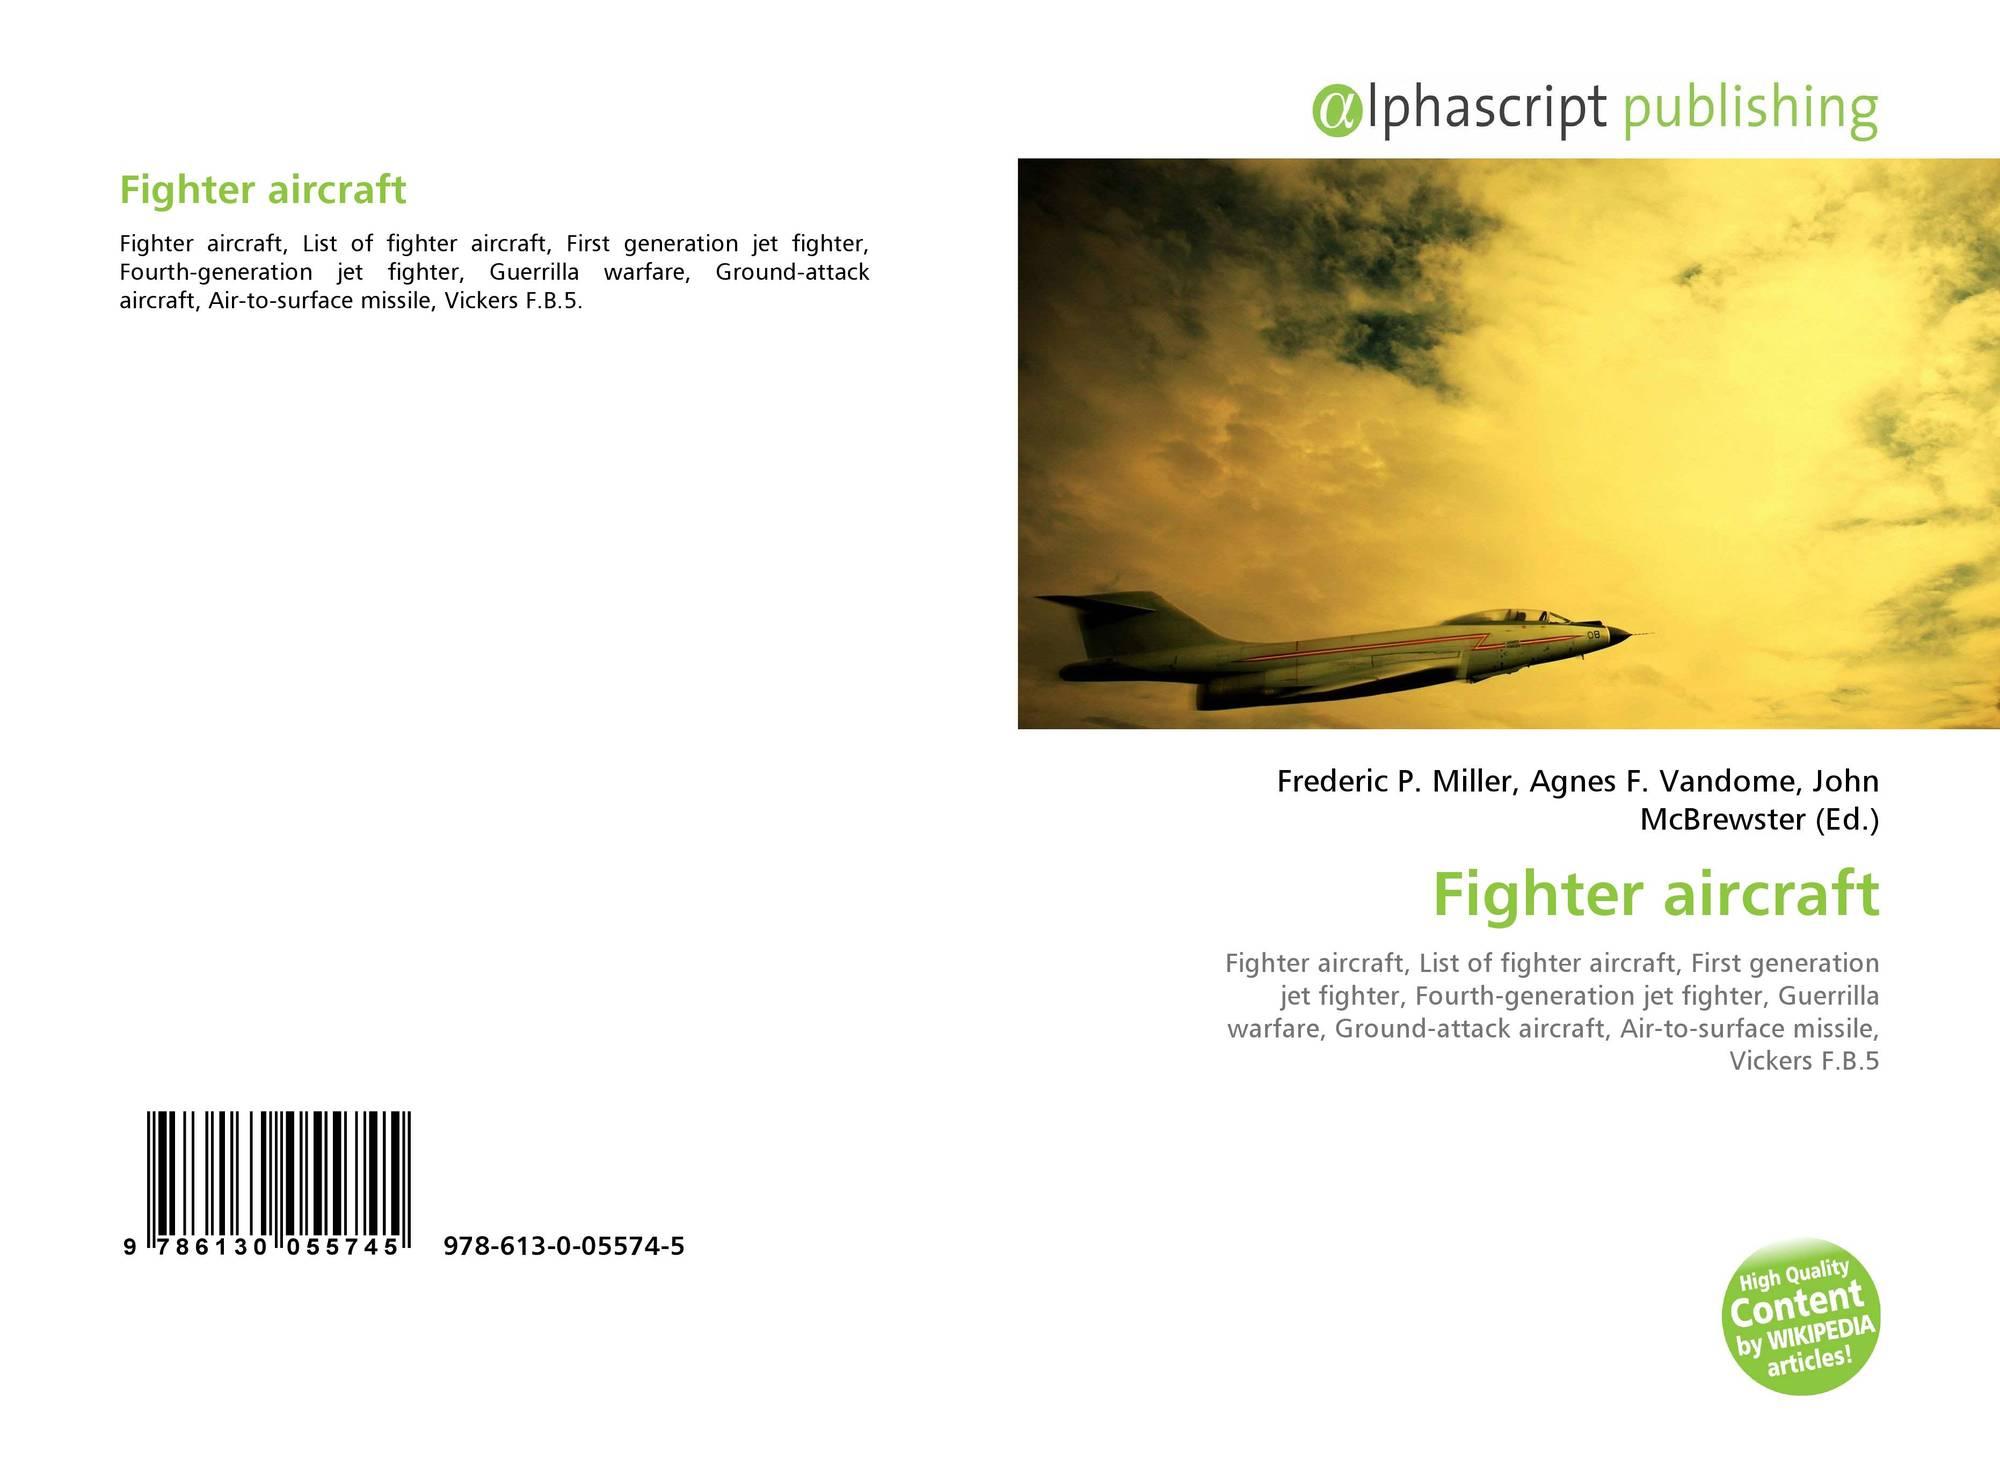 Fighter aircraft, 978-613-0-05574-5, 6130055749 ,9786130055745